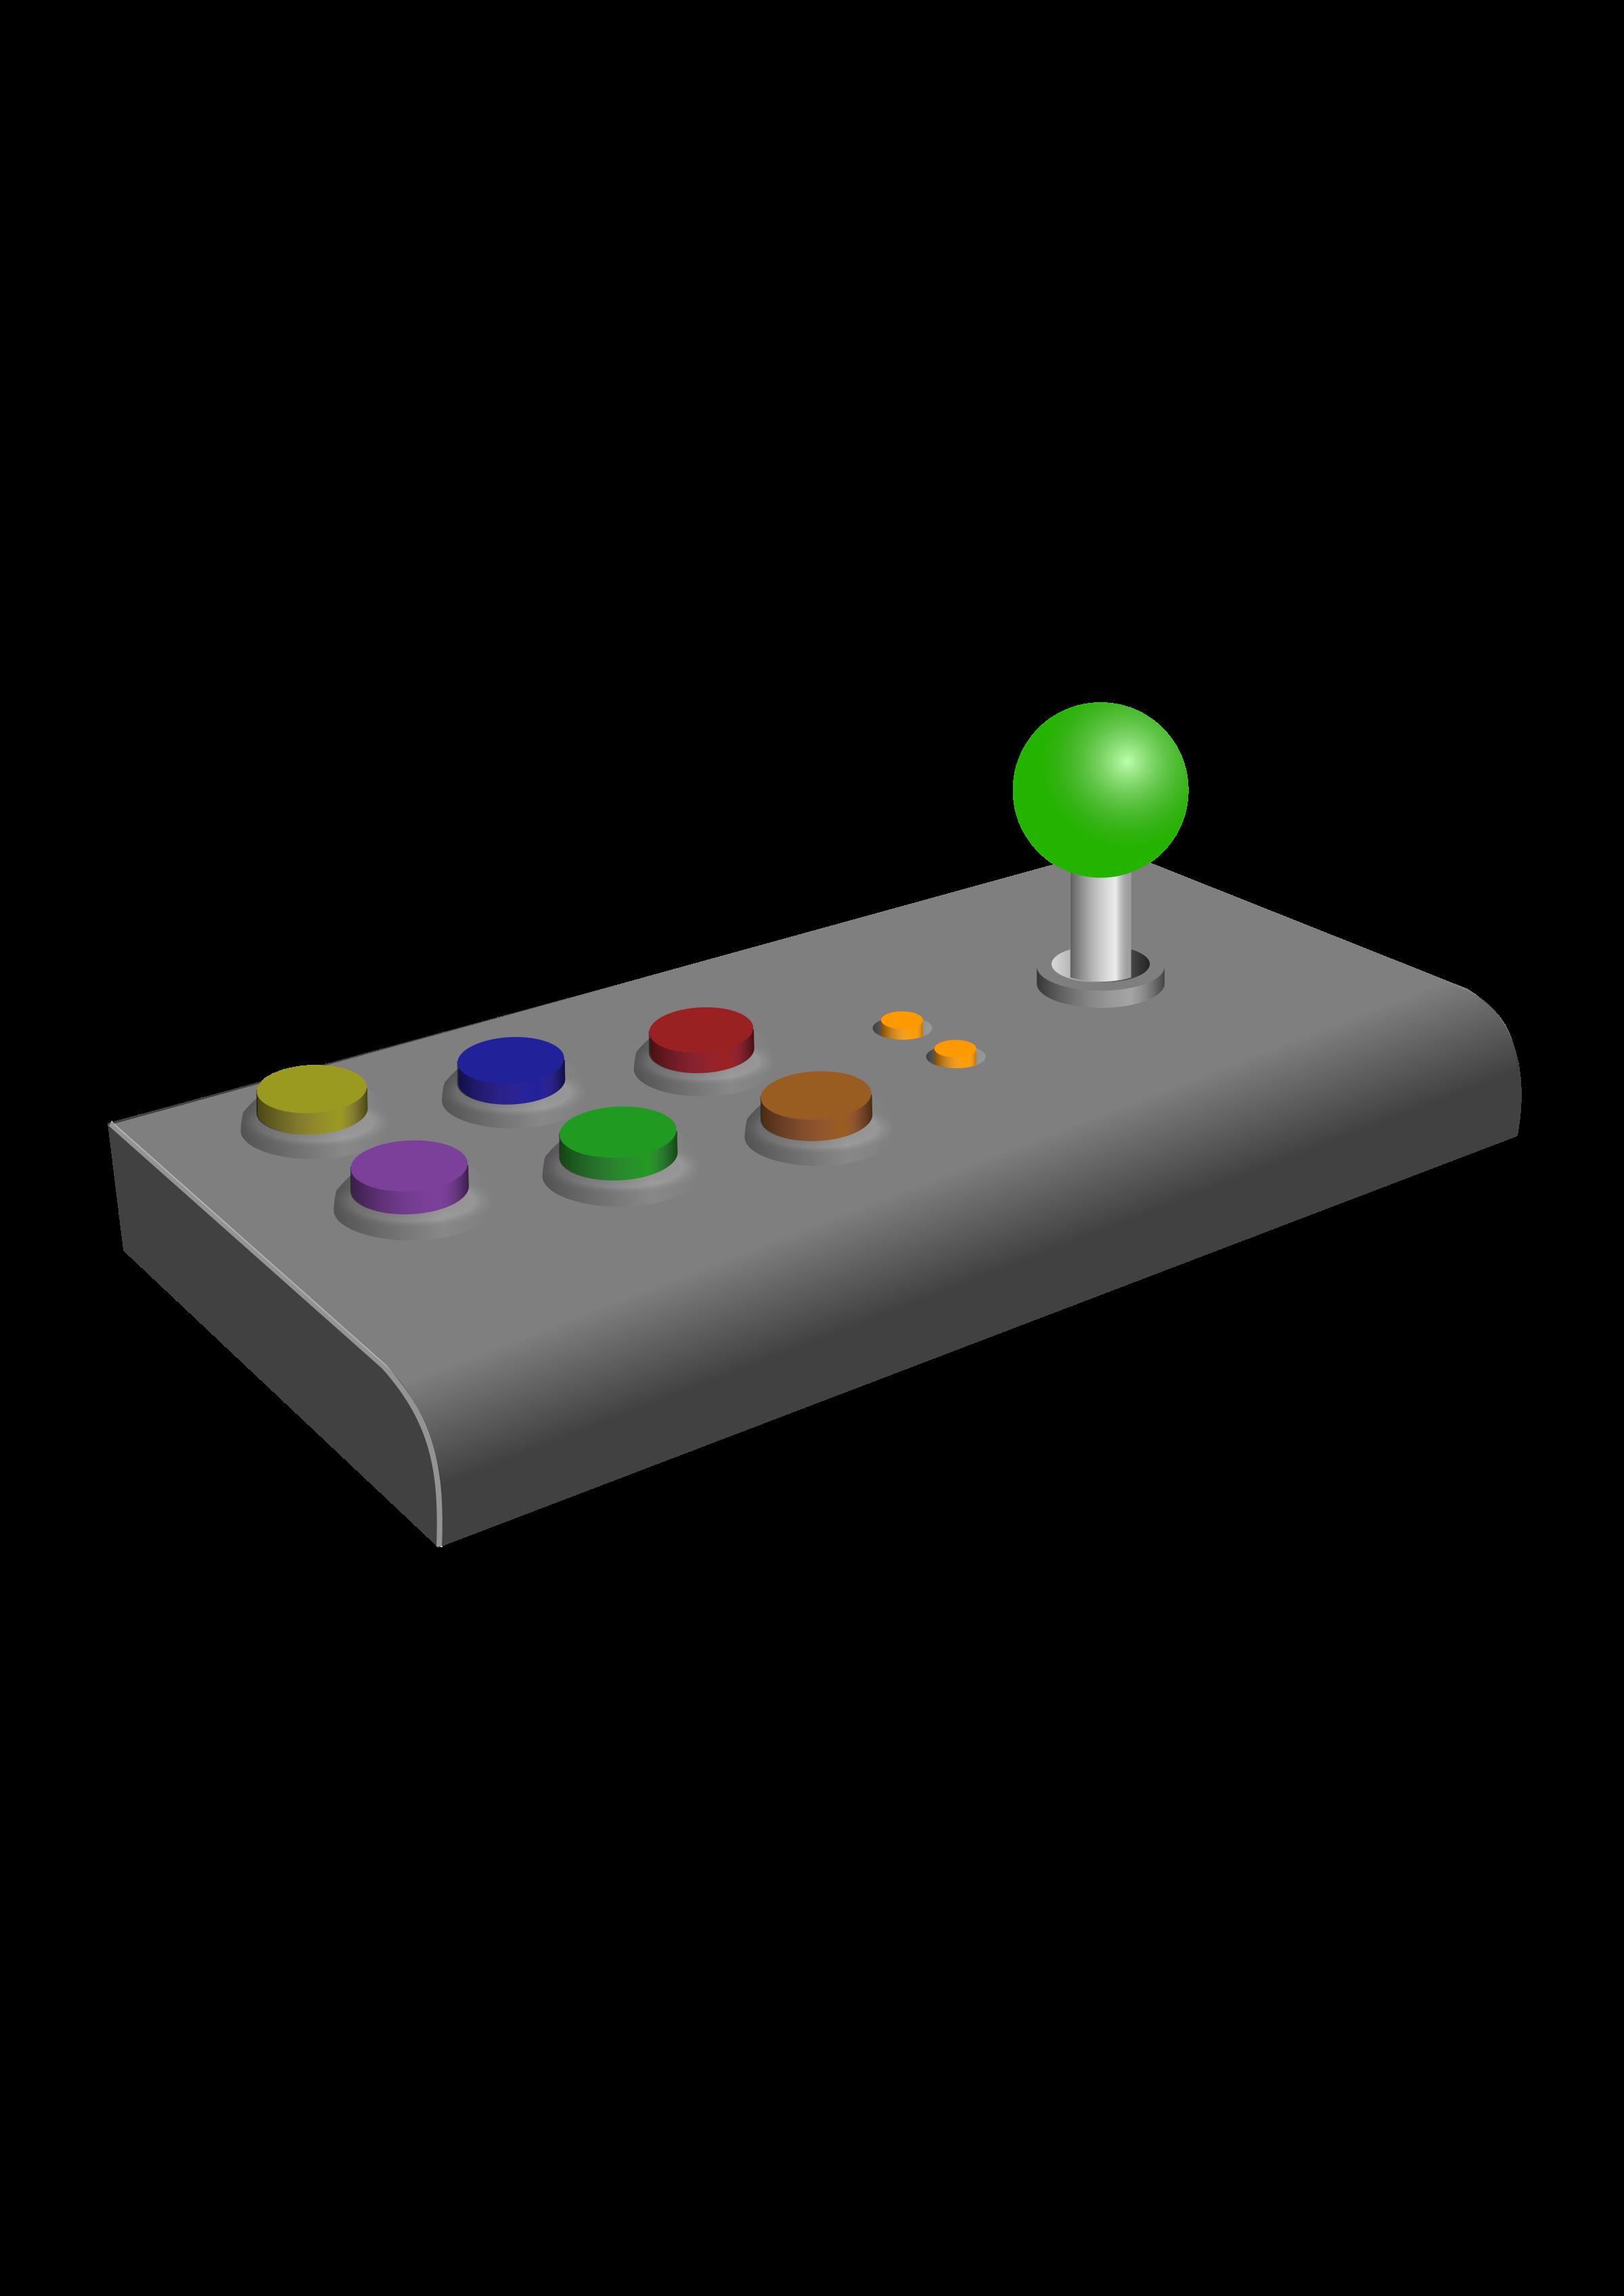 Electronics clipart controller. Retro arcade joystick big